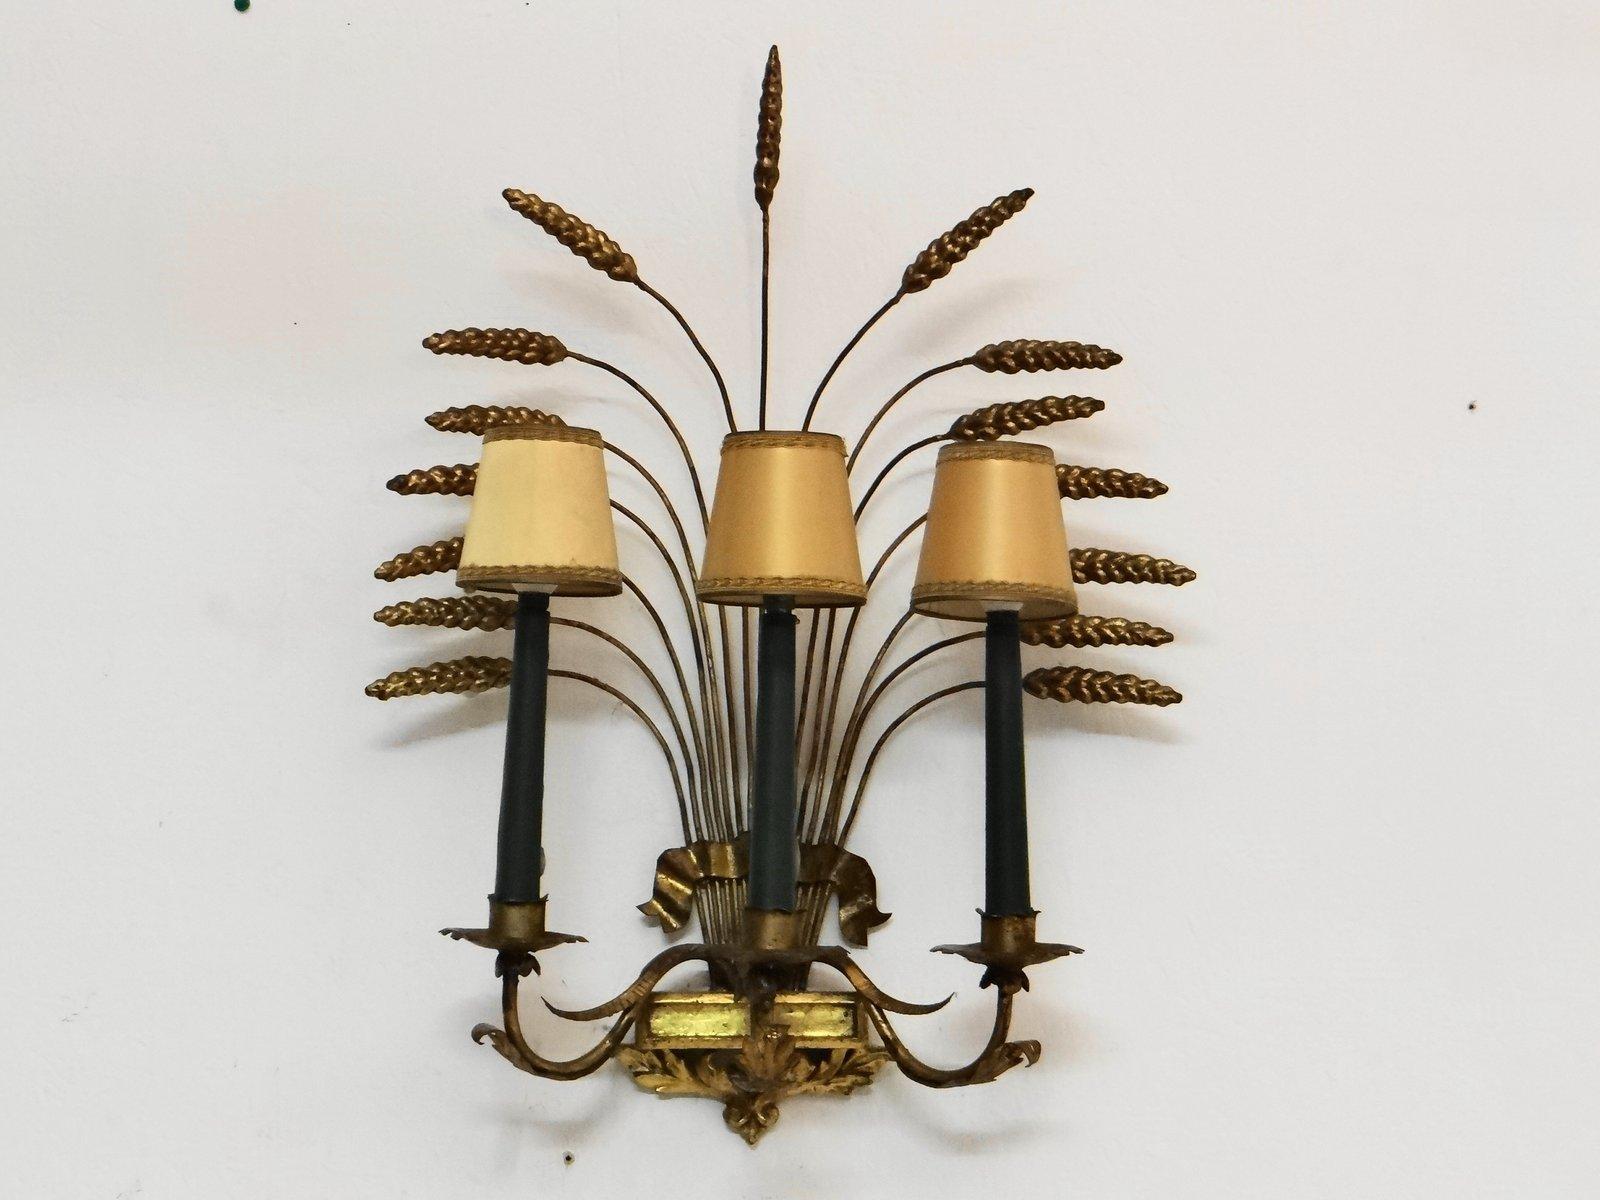 Vergoldete Vintage Wandlampe in Mais-Optik